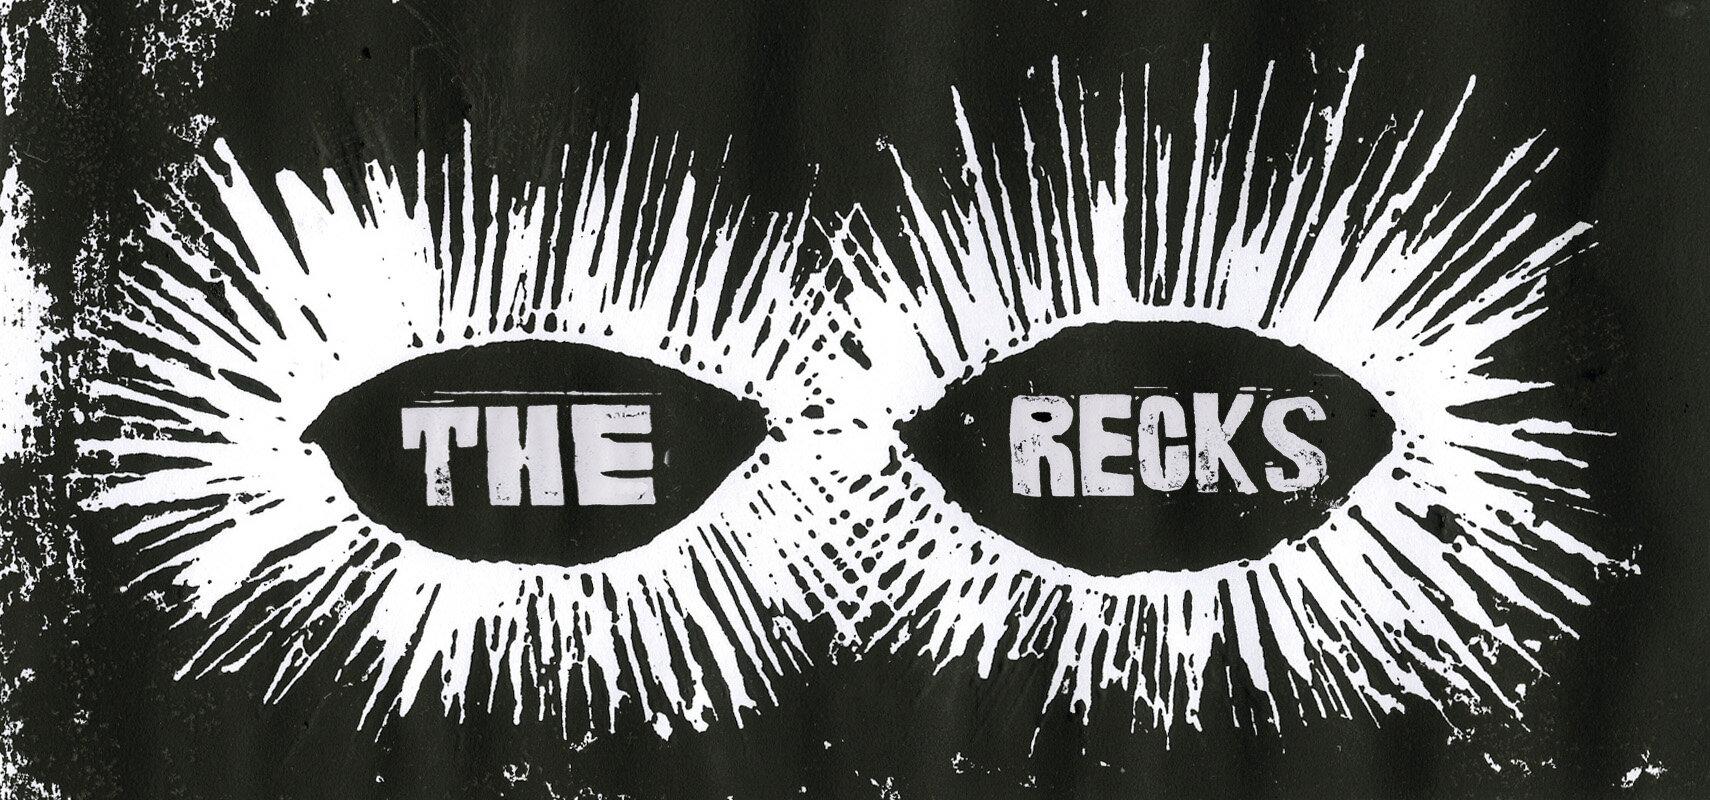 Recks Eyes.jpg